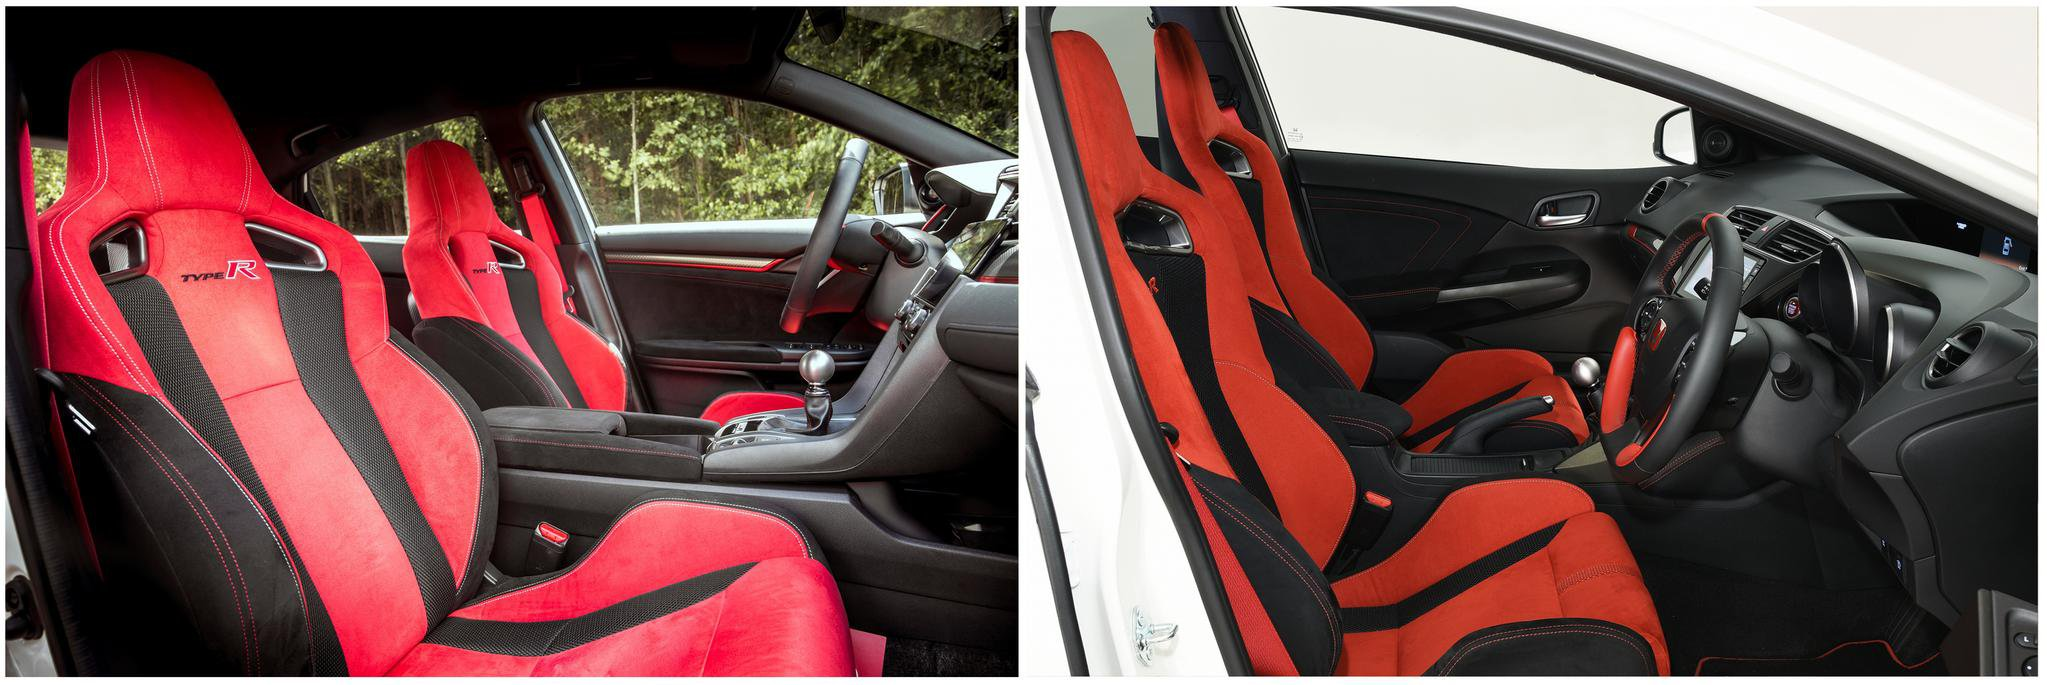 Honda Civic Type R: new vs old compared